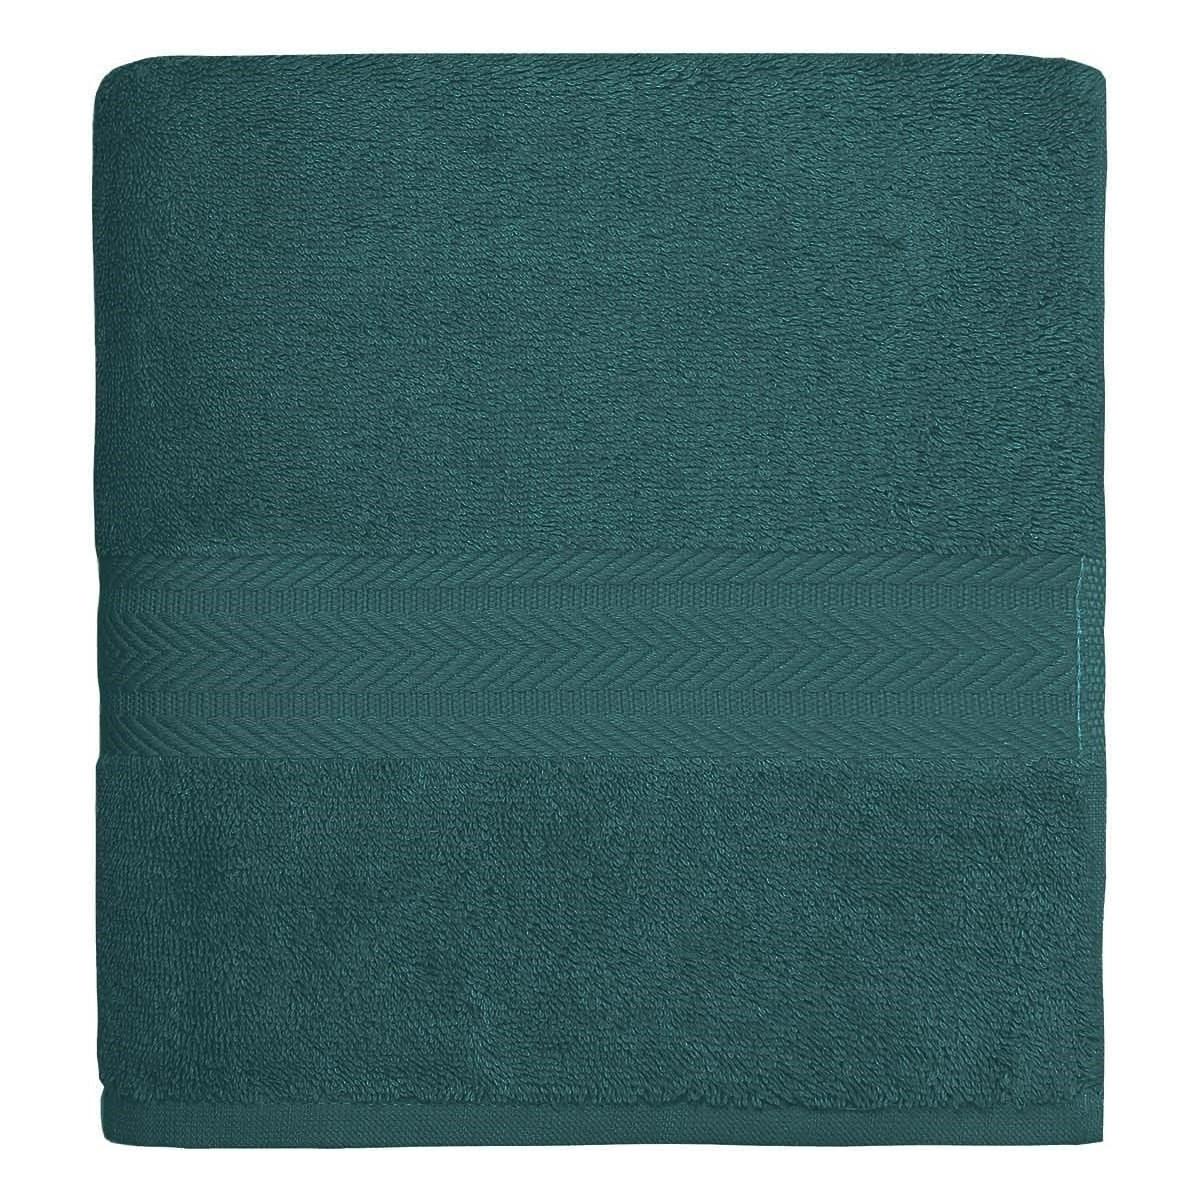 Drap de bain 550gr/m²  Canard 70x140 cm